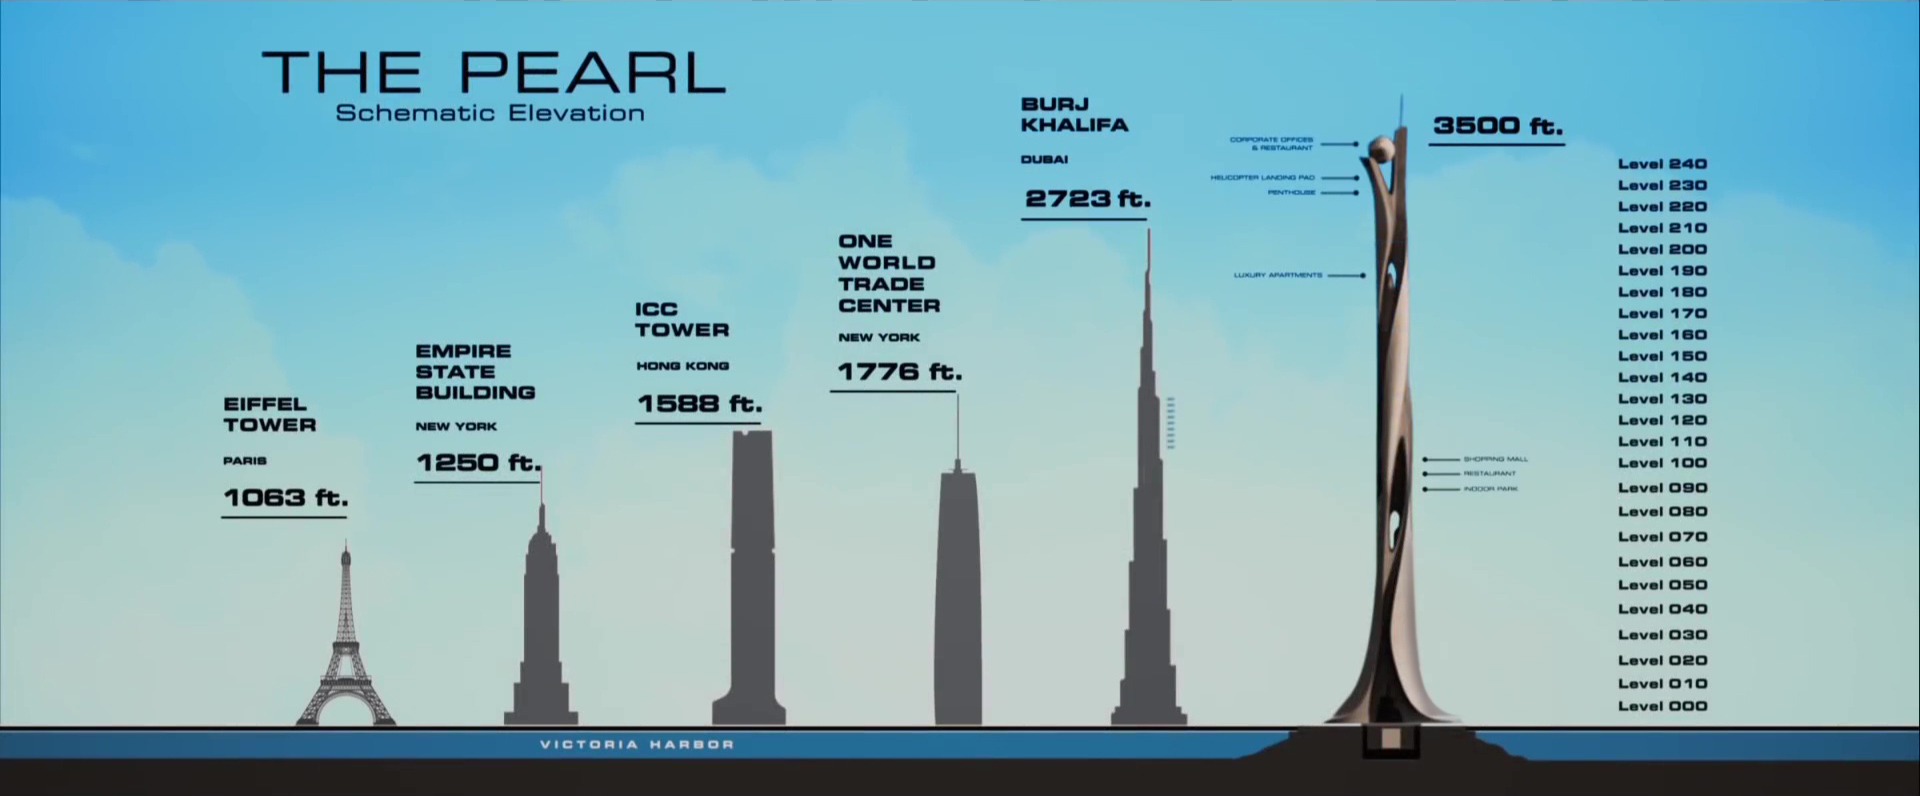 Skyscraper_Movie_Diagram.jpg